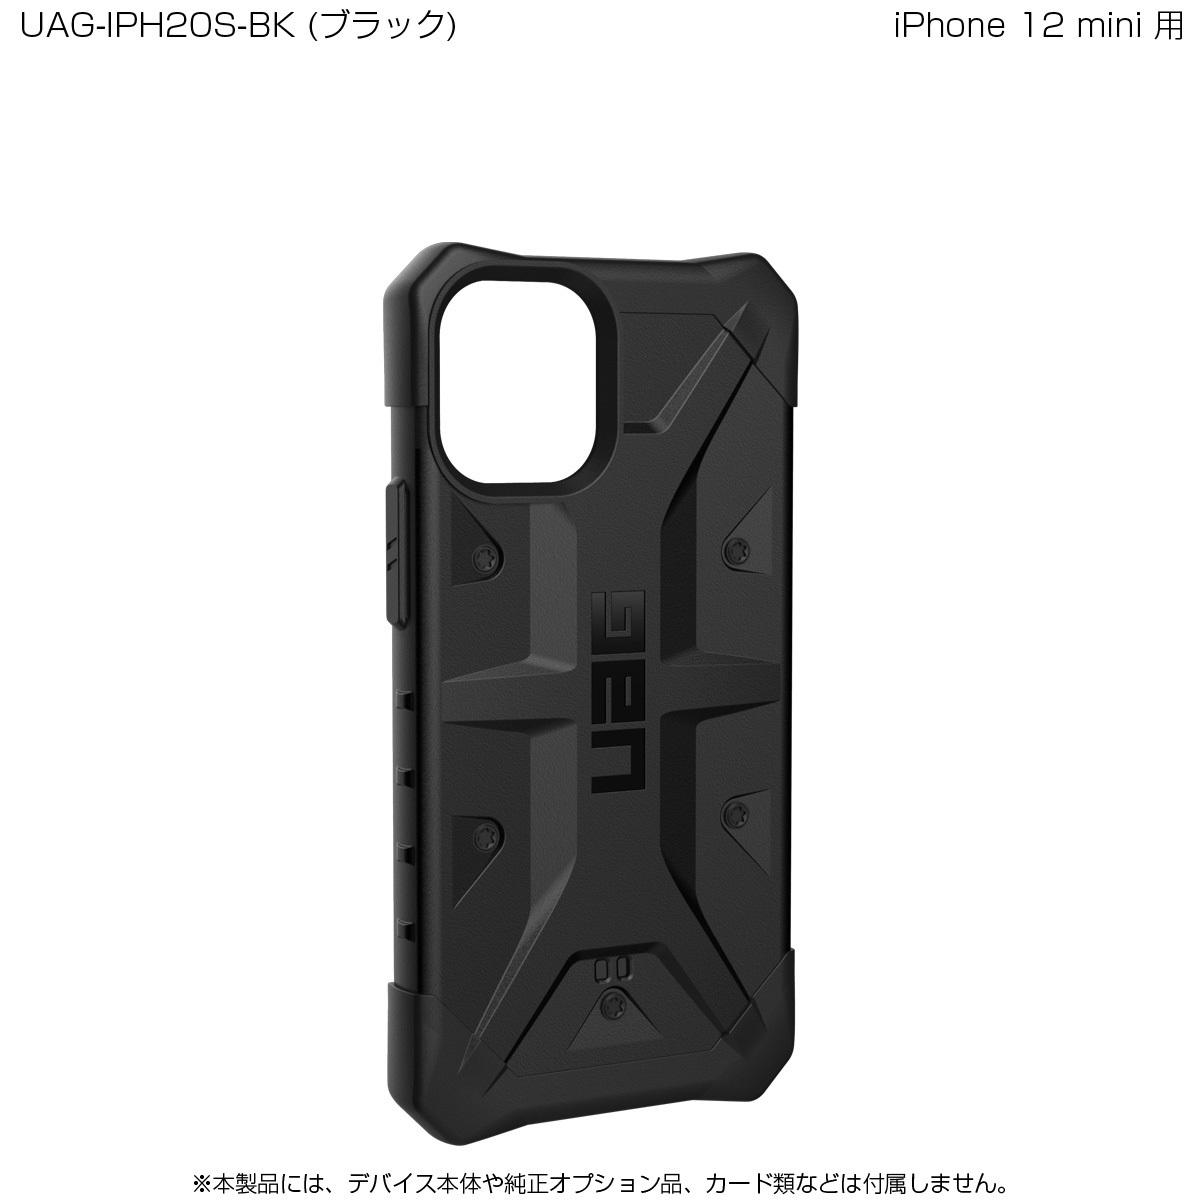 UAG iPhone 12 mini用 PATHFINDERケース スタンダード 全6色 耐衝撃 UAG-IPH20Sシリーズ 5.4インチ